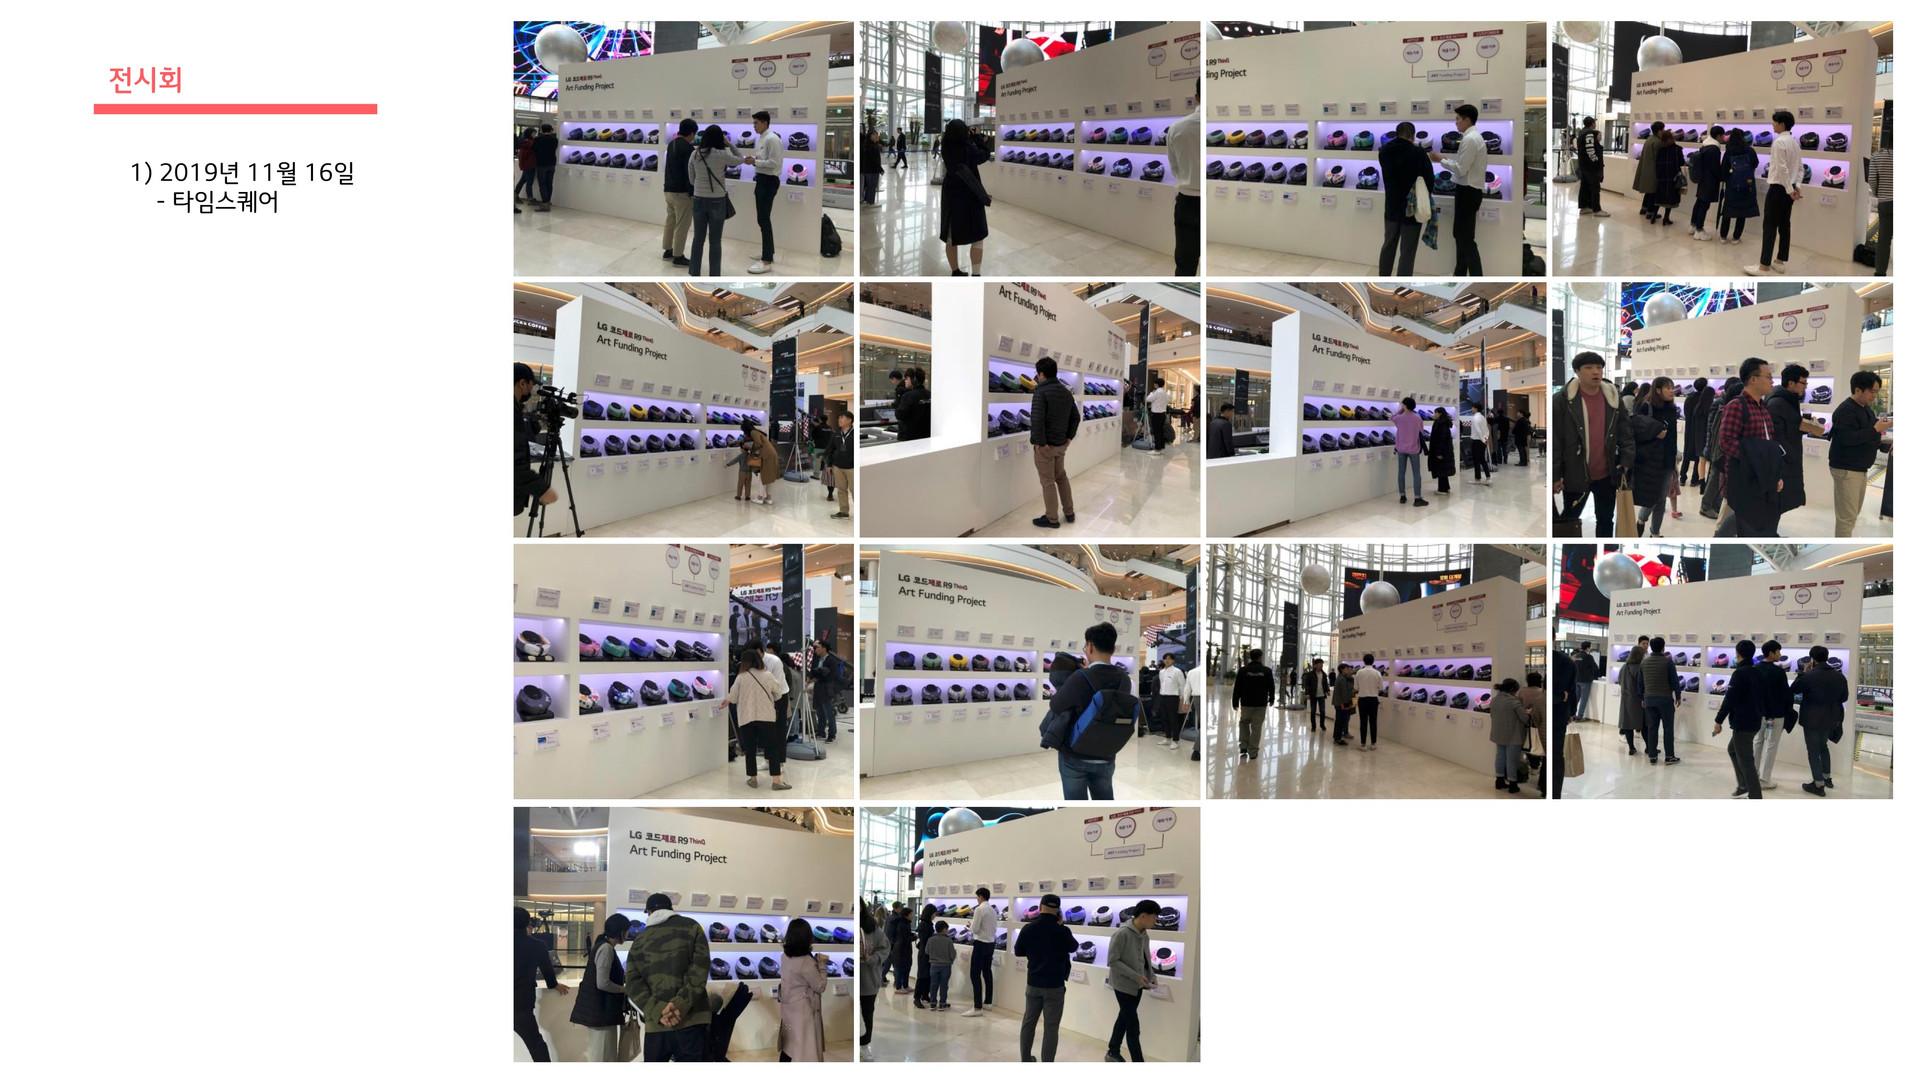 ART Funding Project_Exhibition_2 2.JPG